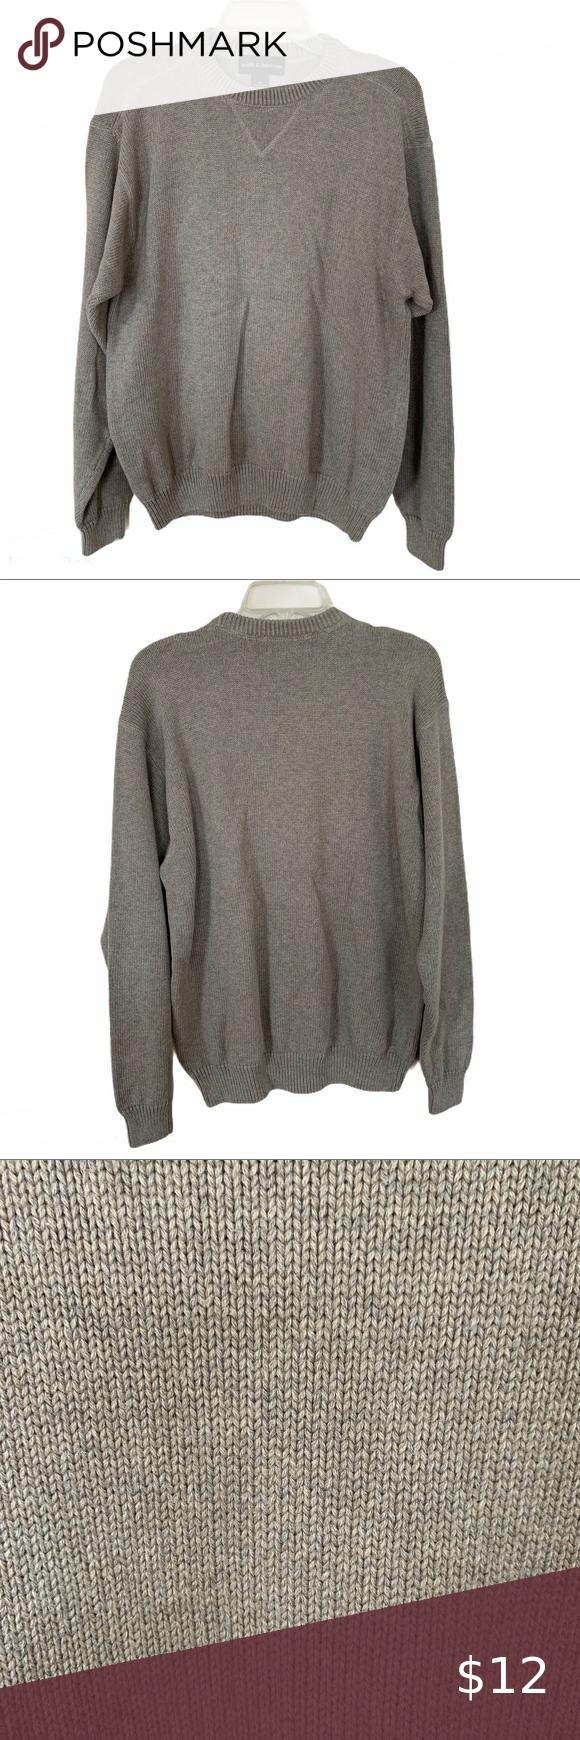 Croft And Barrow Men S Medium Beige Sweater Beige Sweater Sweaters Croft And Barrow [ 1740 x 580 Pixel ]